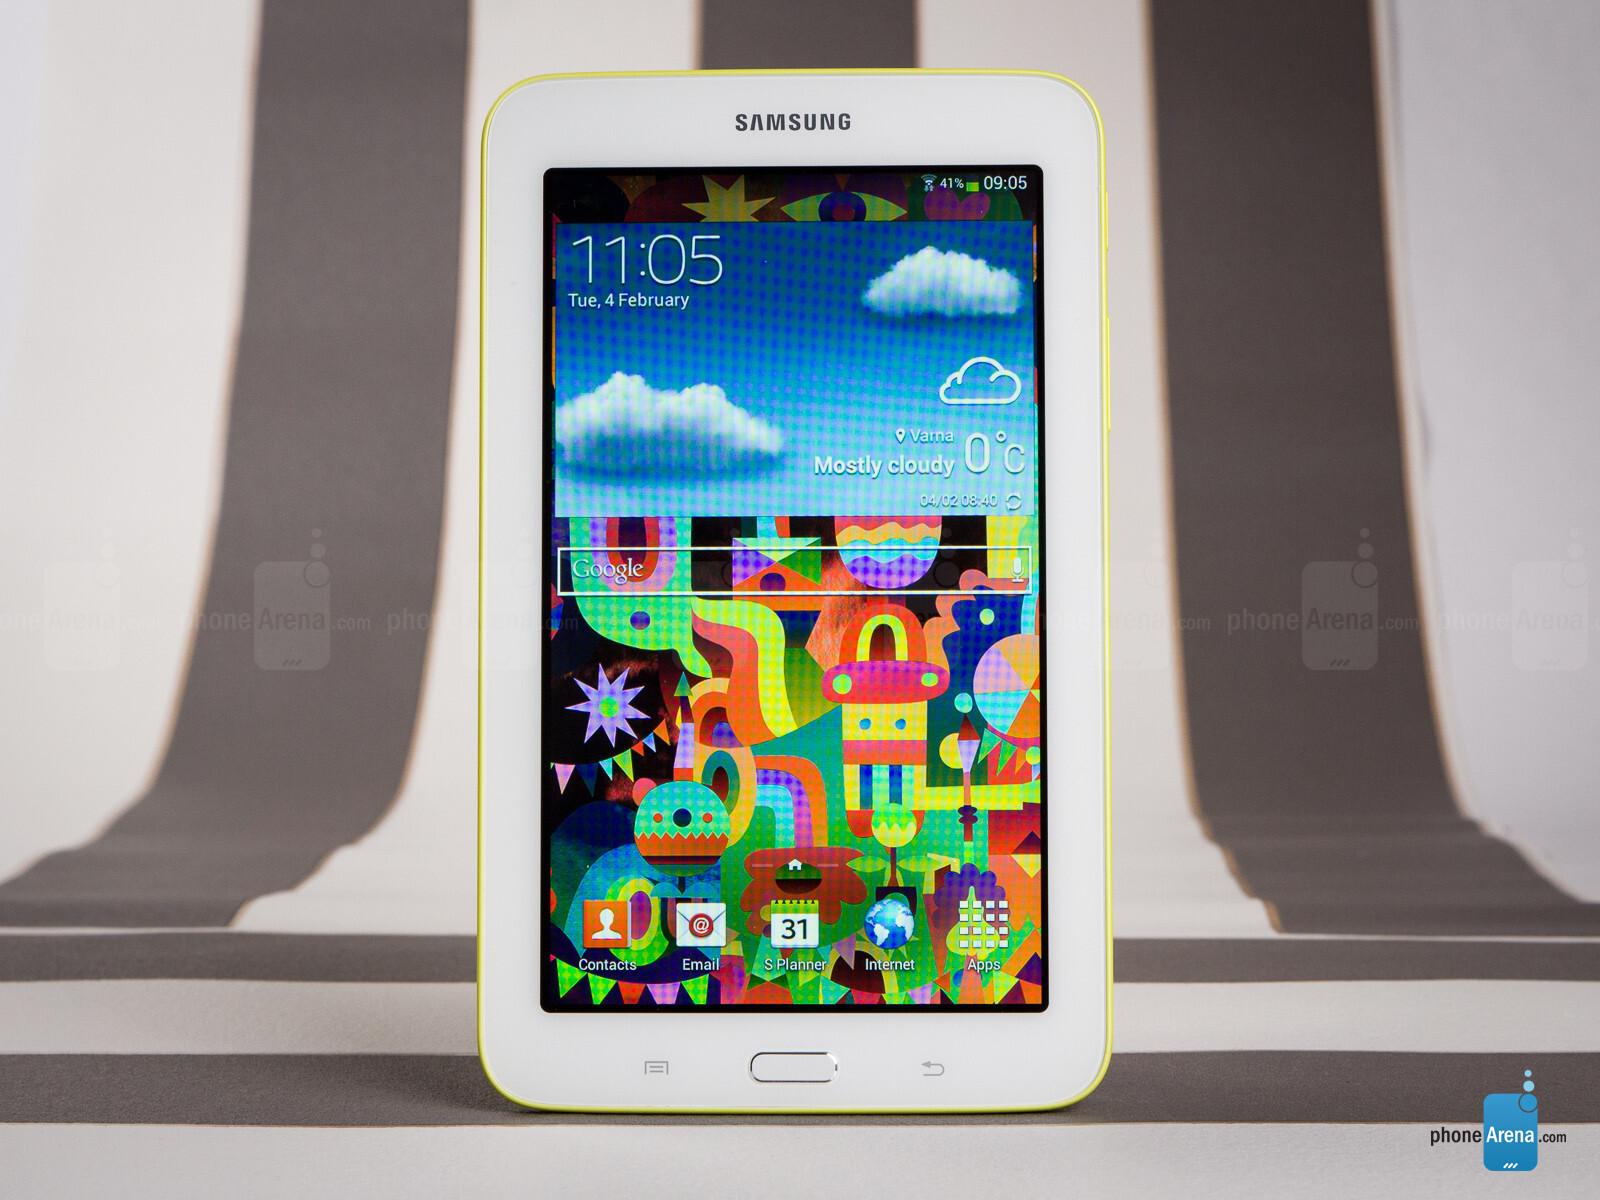 amazone verschillende stijlen nieuwe release Samsung Galaxy Tab 3 Lite Preview - PhoneArena